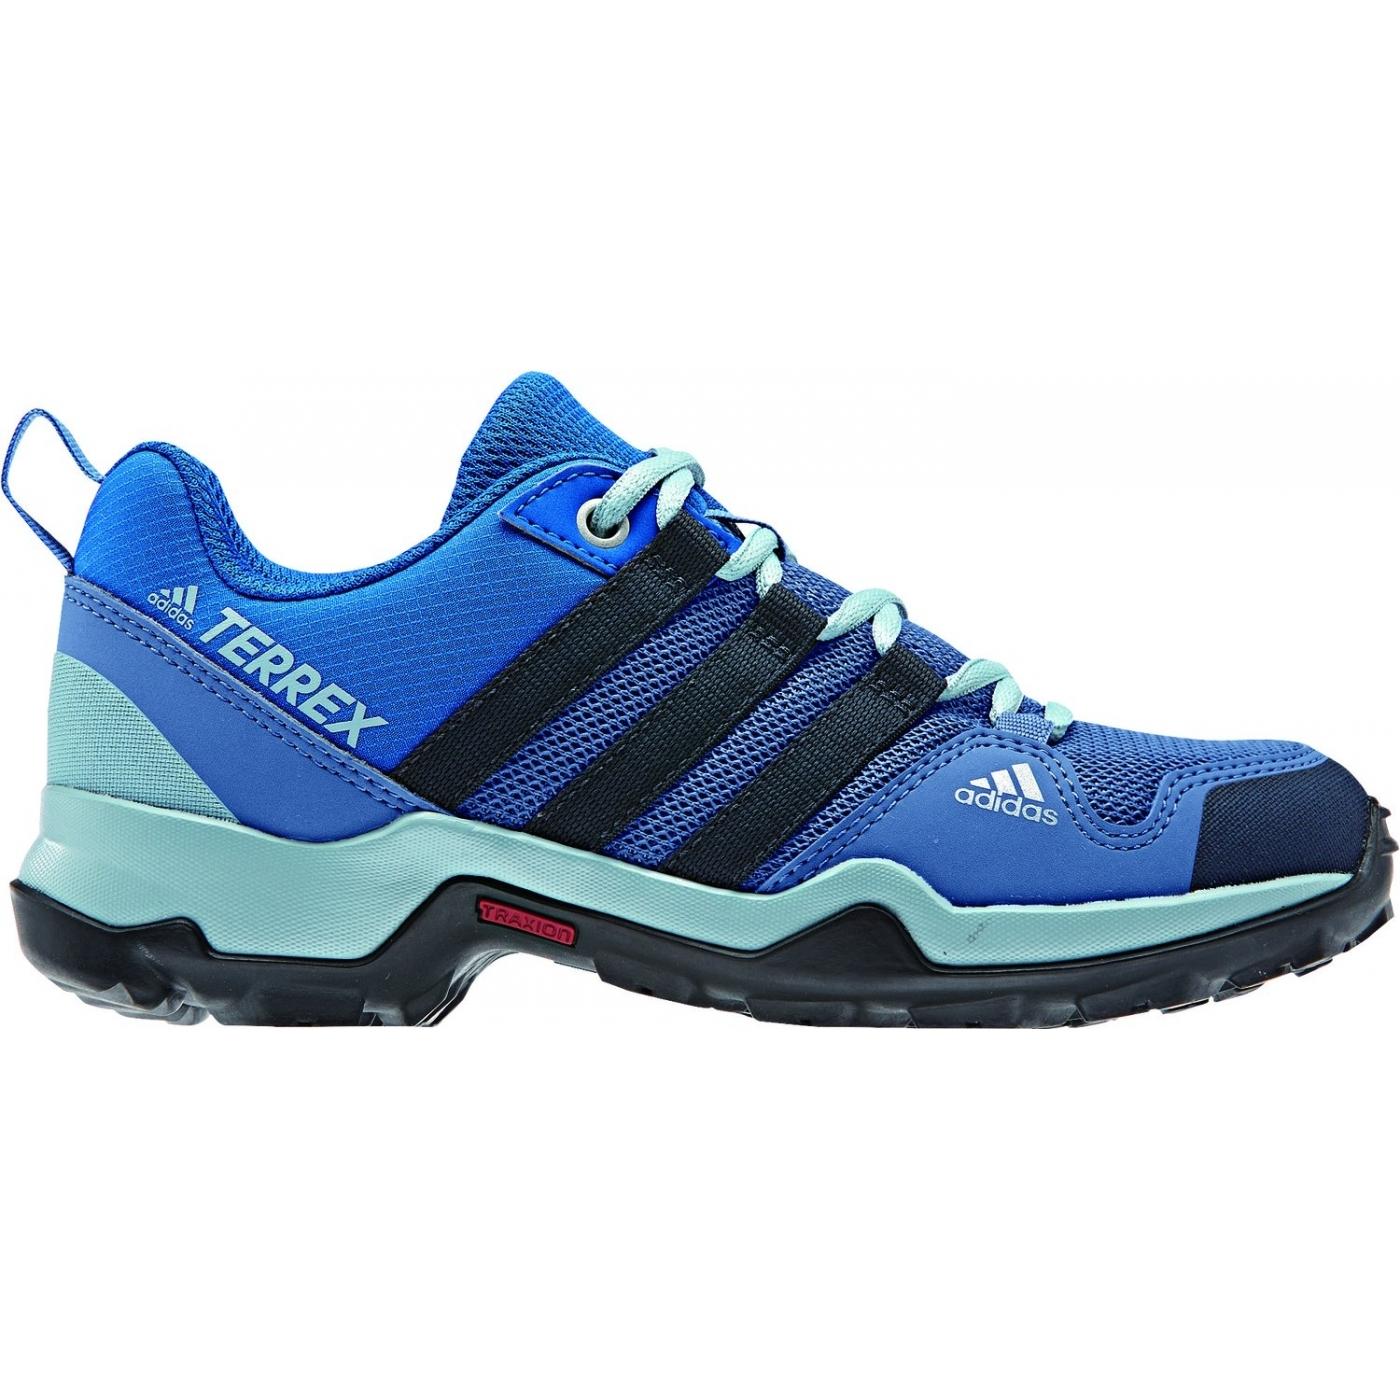 Navy Terrex Chaussures Ax2r Randonnée Royal K Adidas wqOM6zBYx